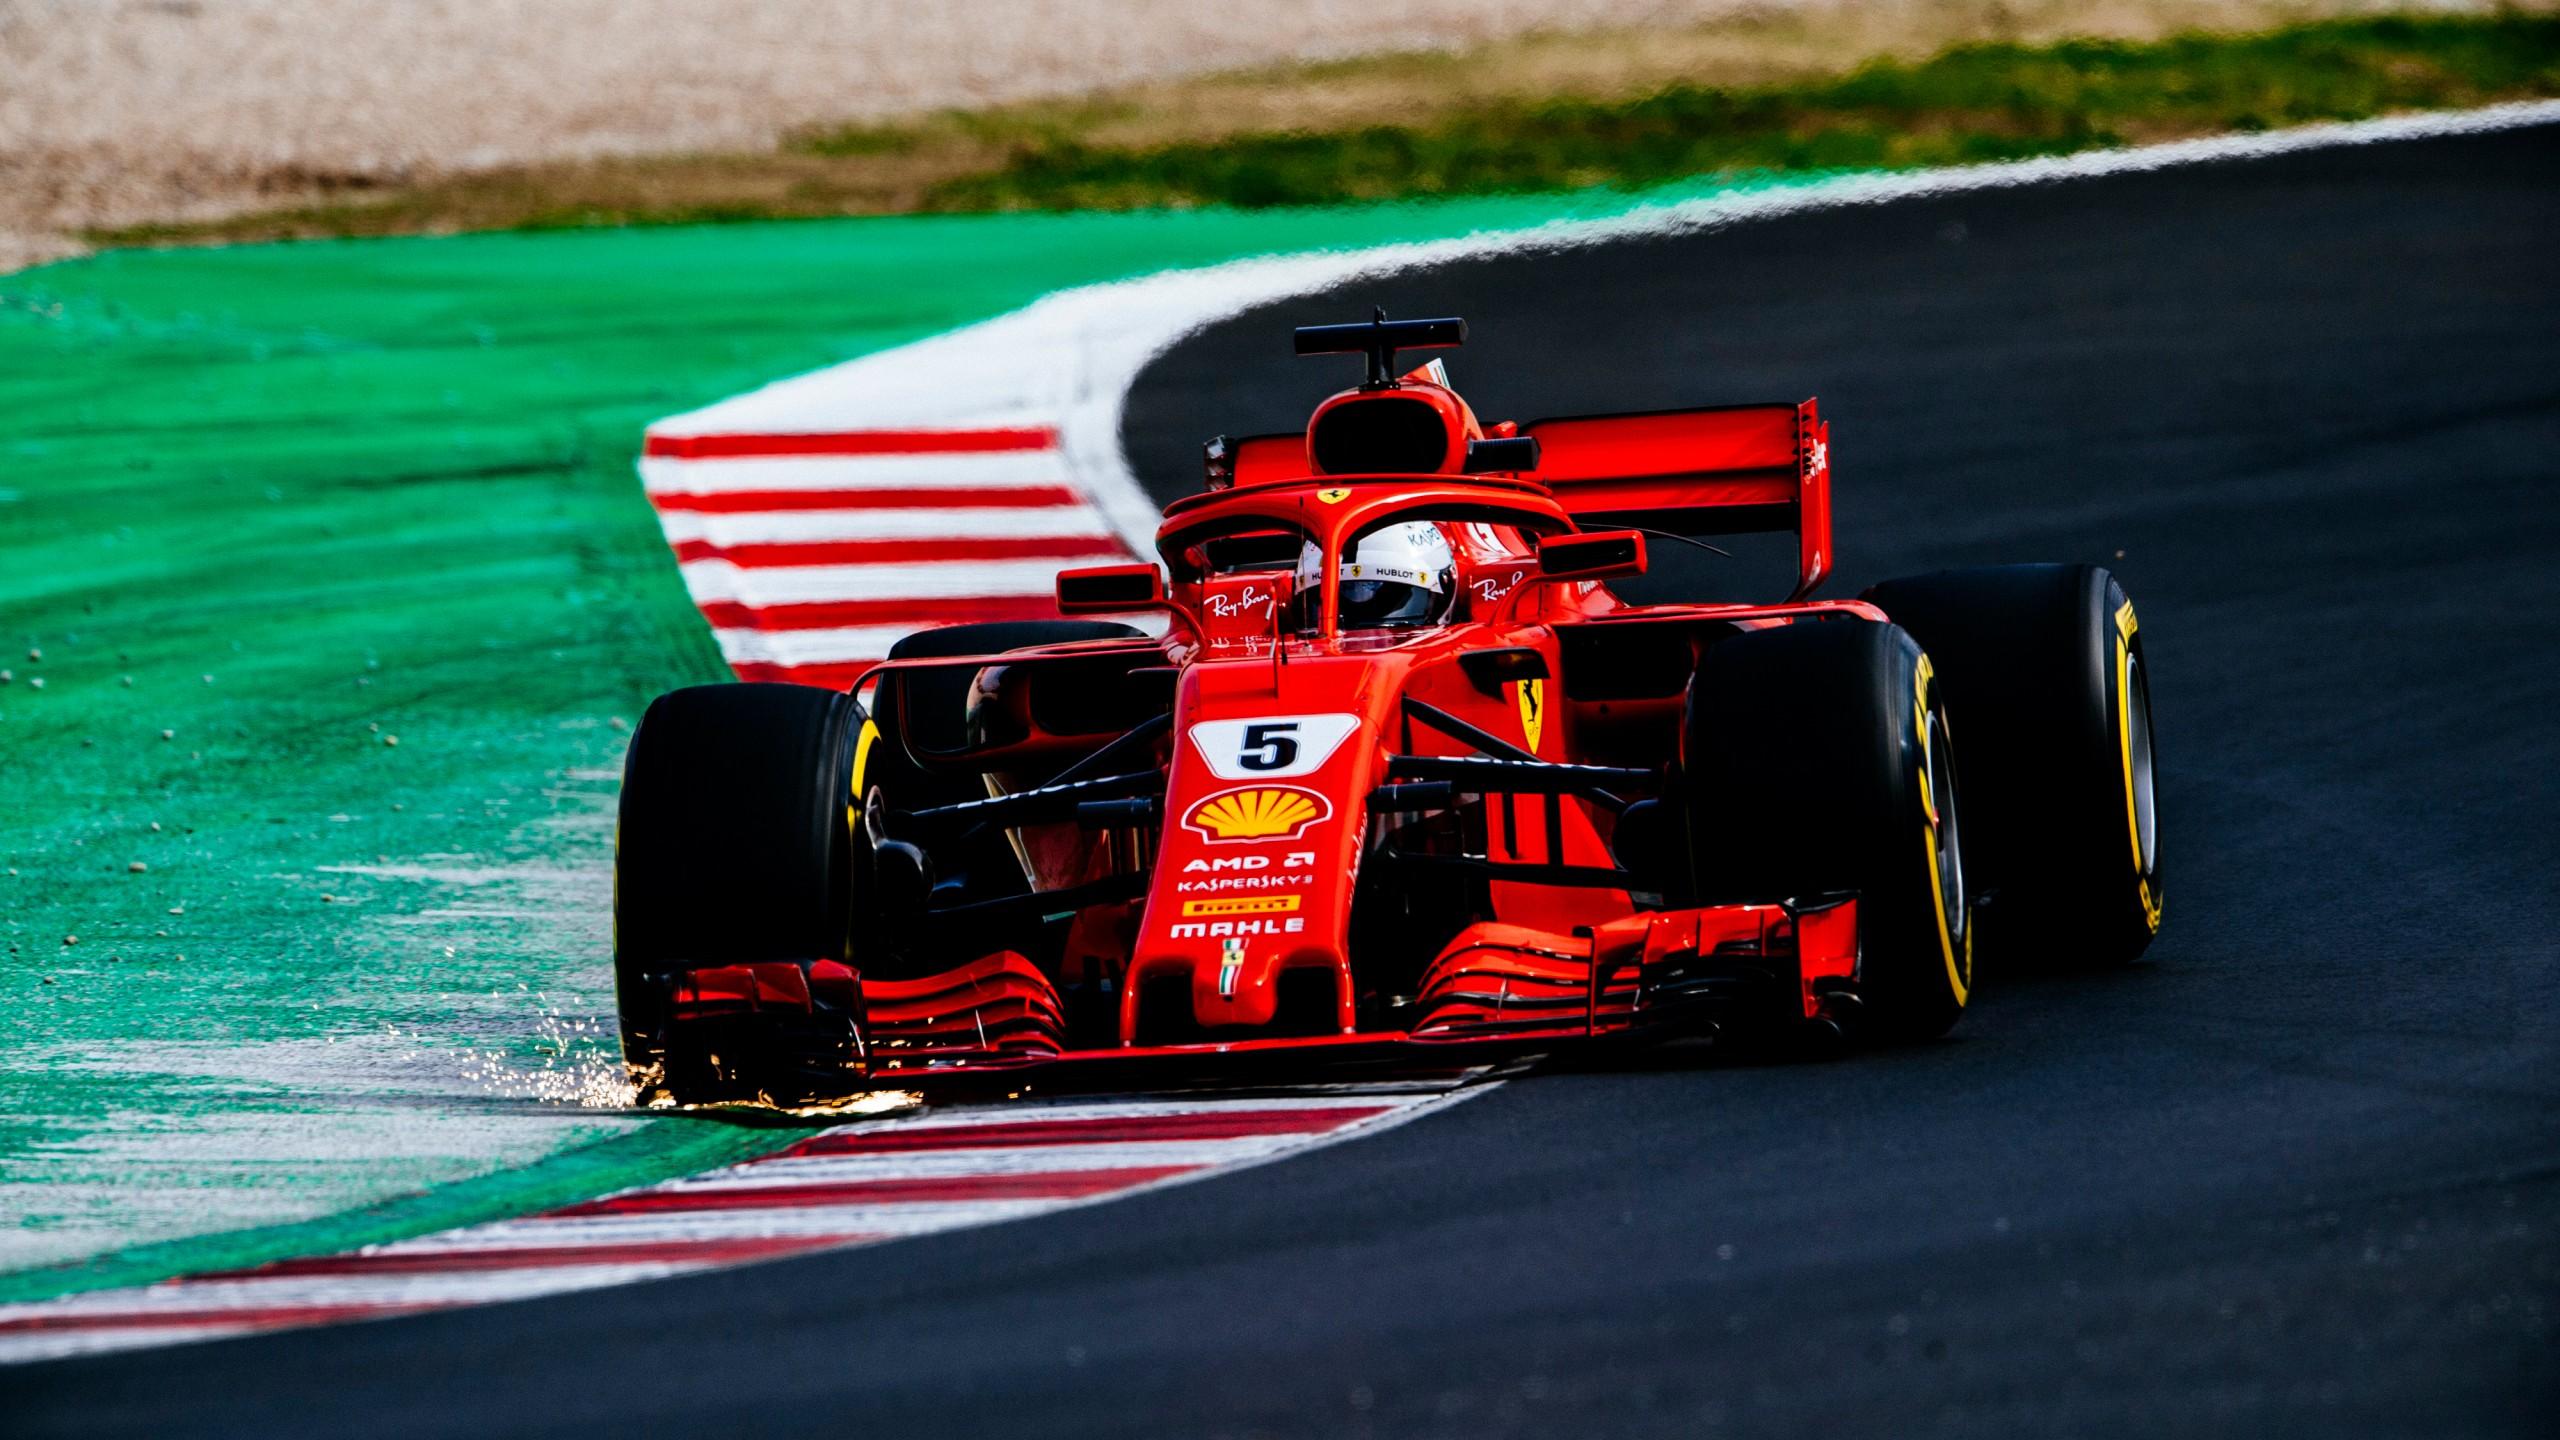 2018 Ferrari Sf71h F1 Formula 1 4k 2 Wallpaper Hd Car Wallpapers Id 9653